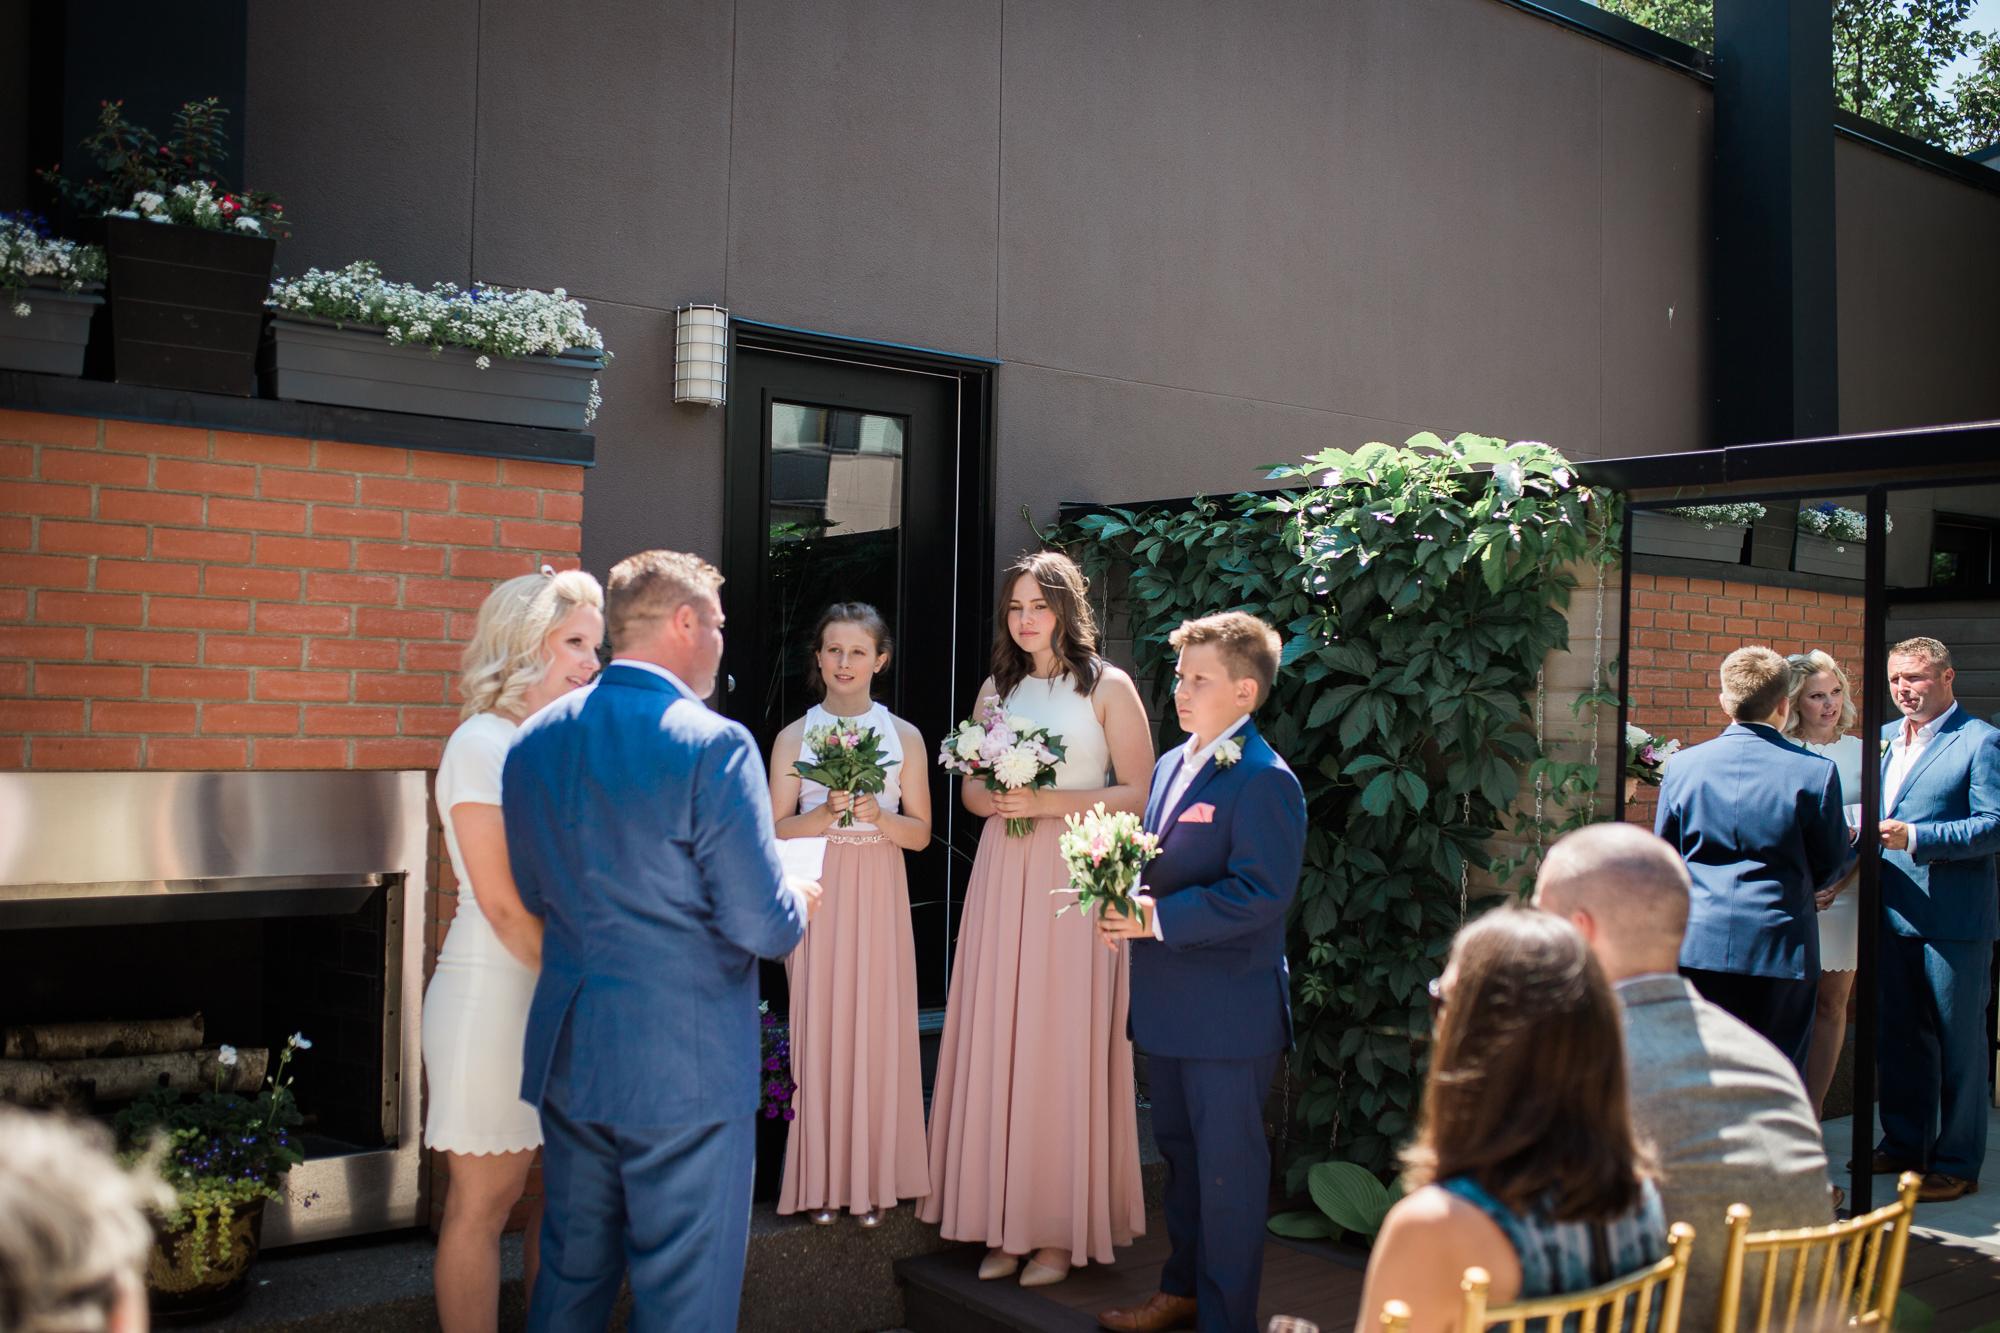 Calgary-wedding-photographer-CG-29.jpg